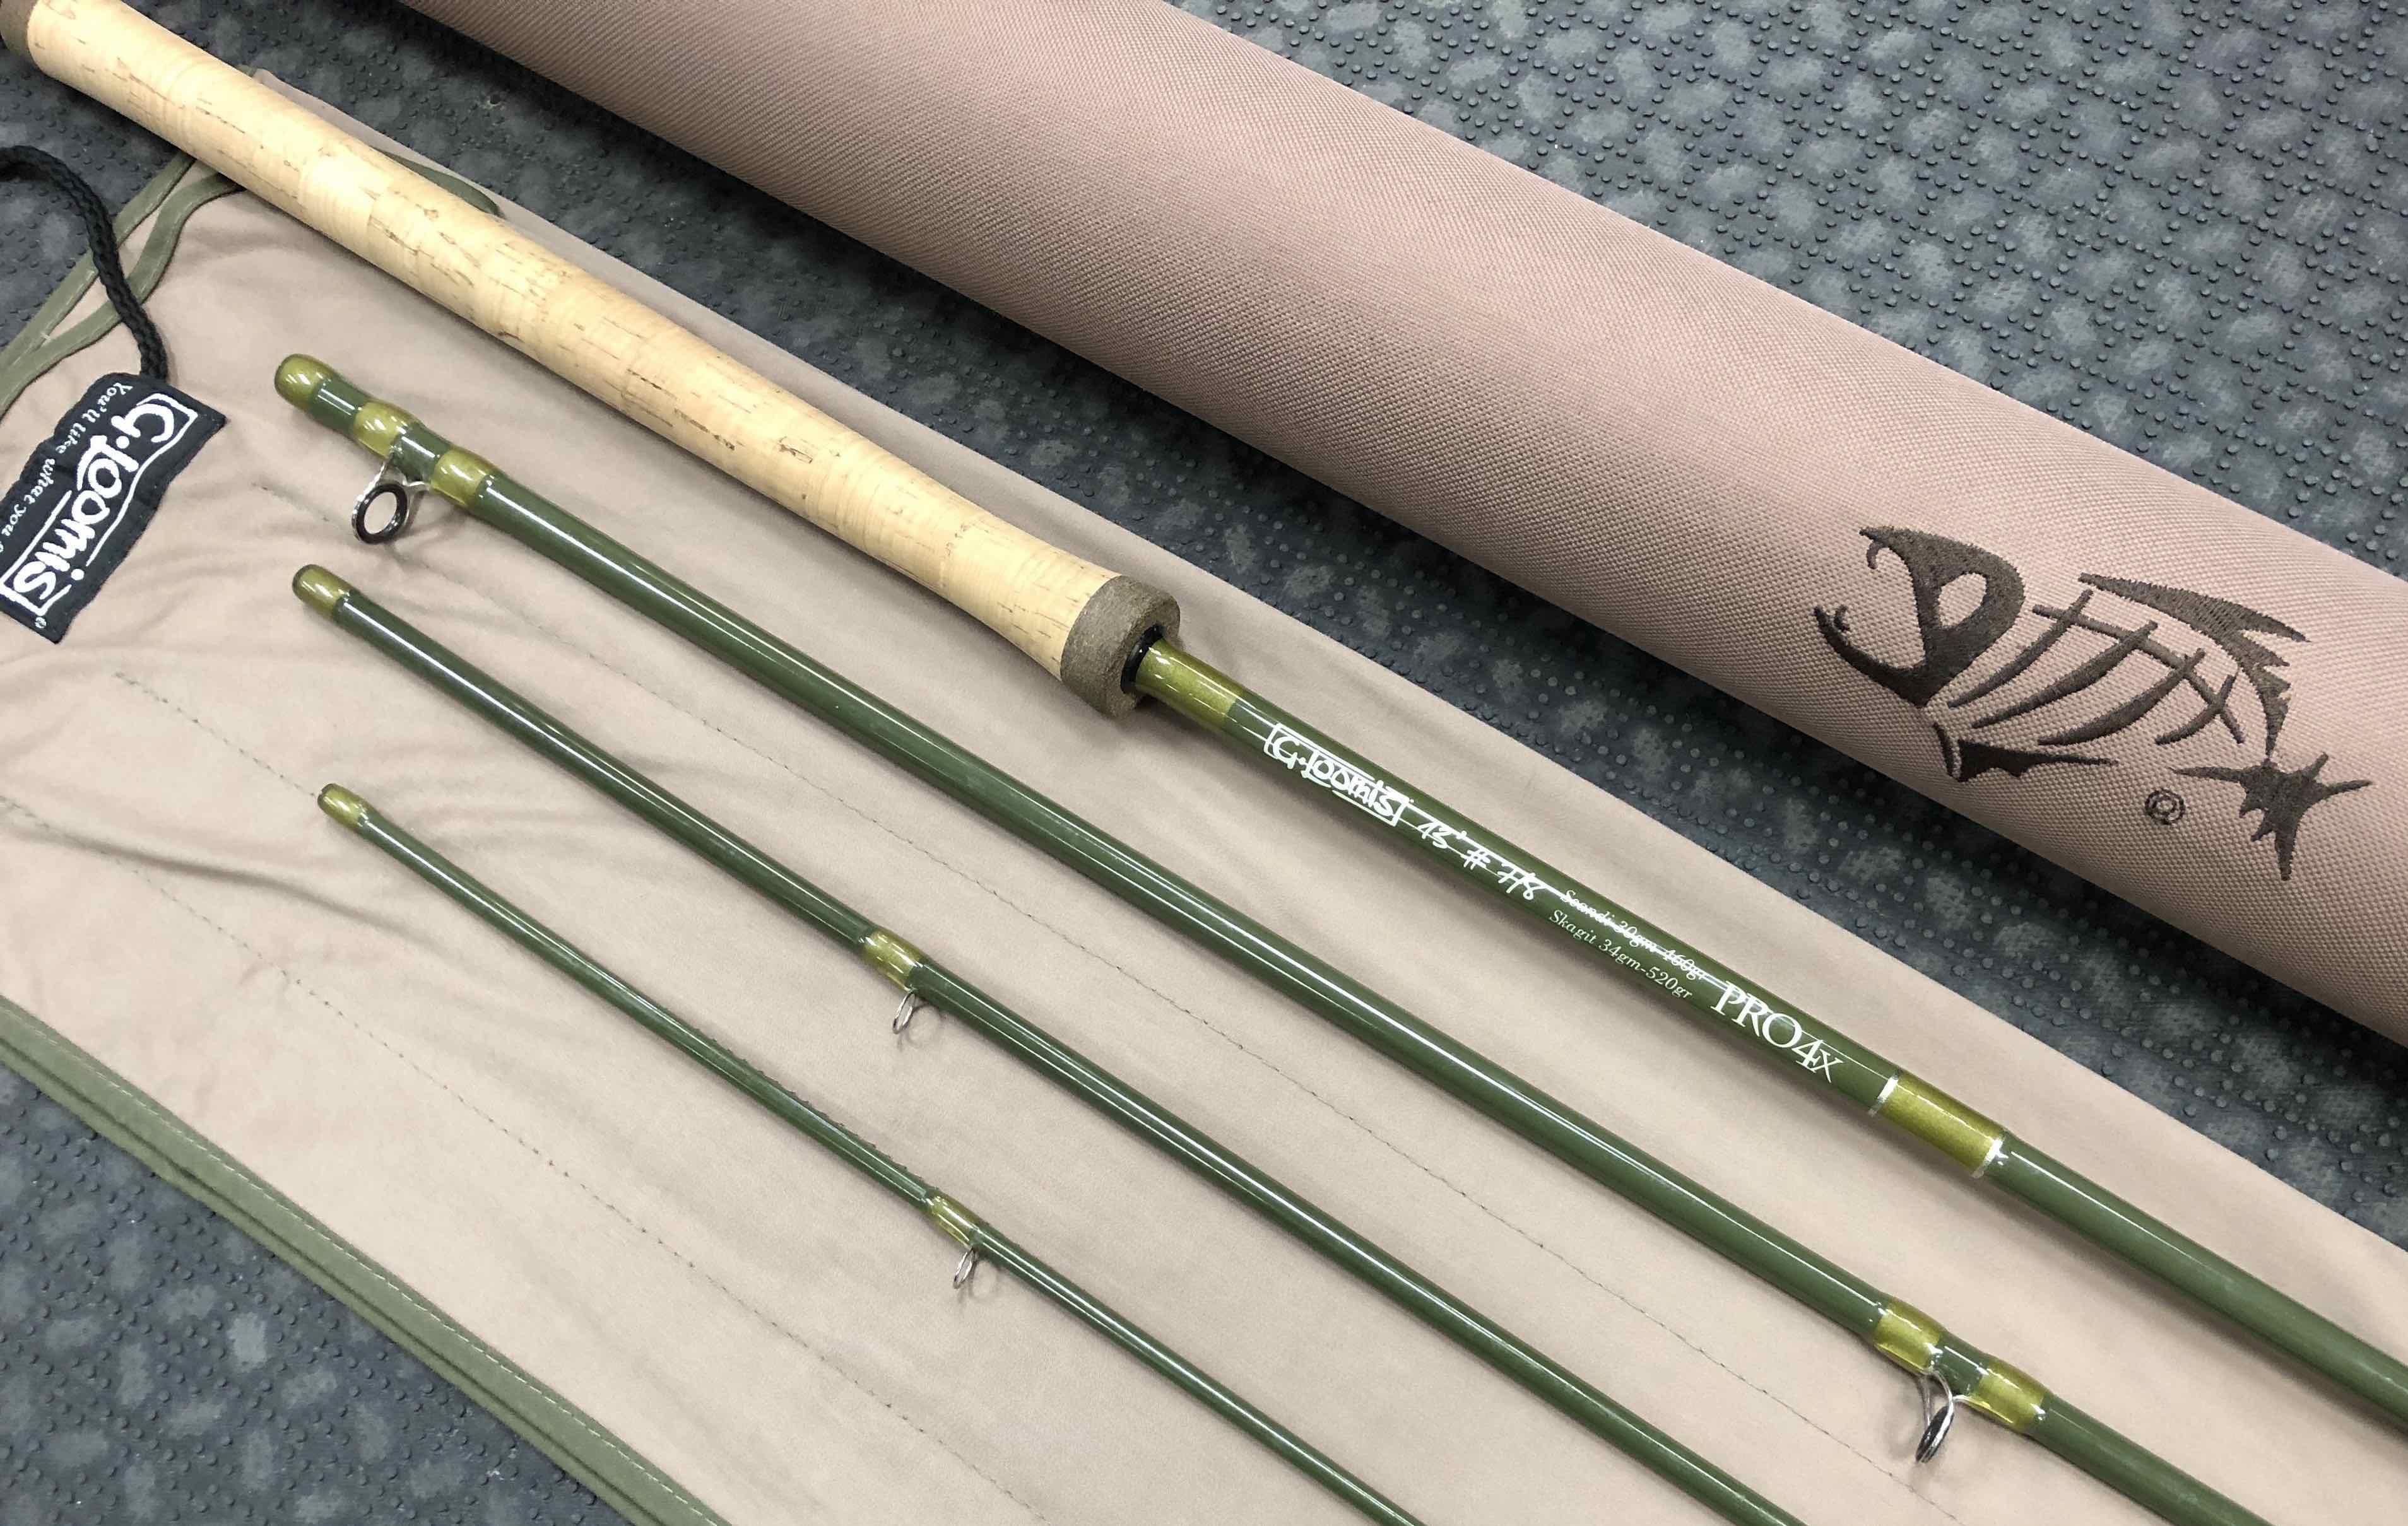 G. Loomis Pro 4X Spey Rod - 13' 7/8 Wt 4pc - LIKE NEW! - $350